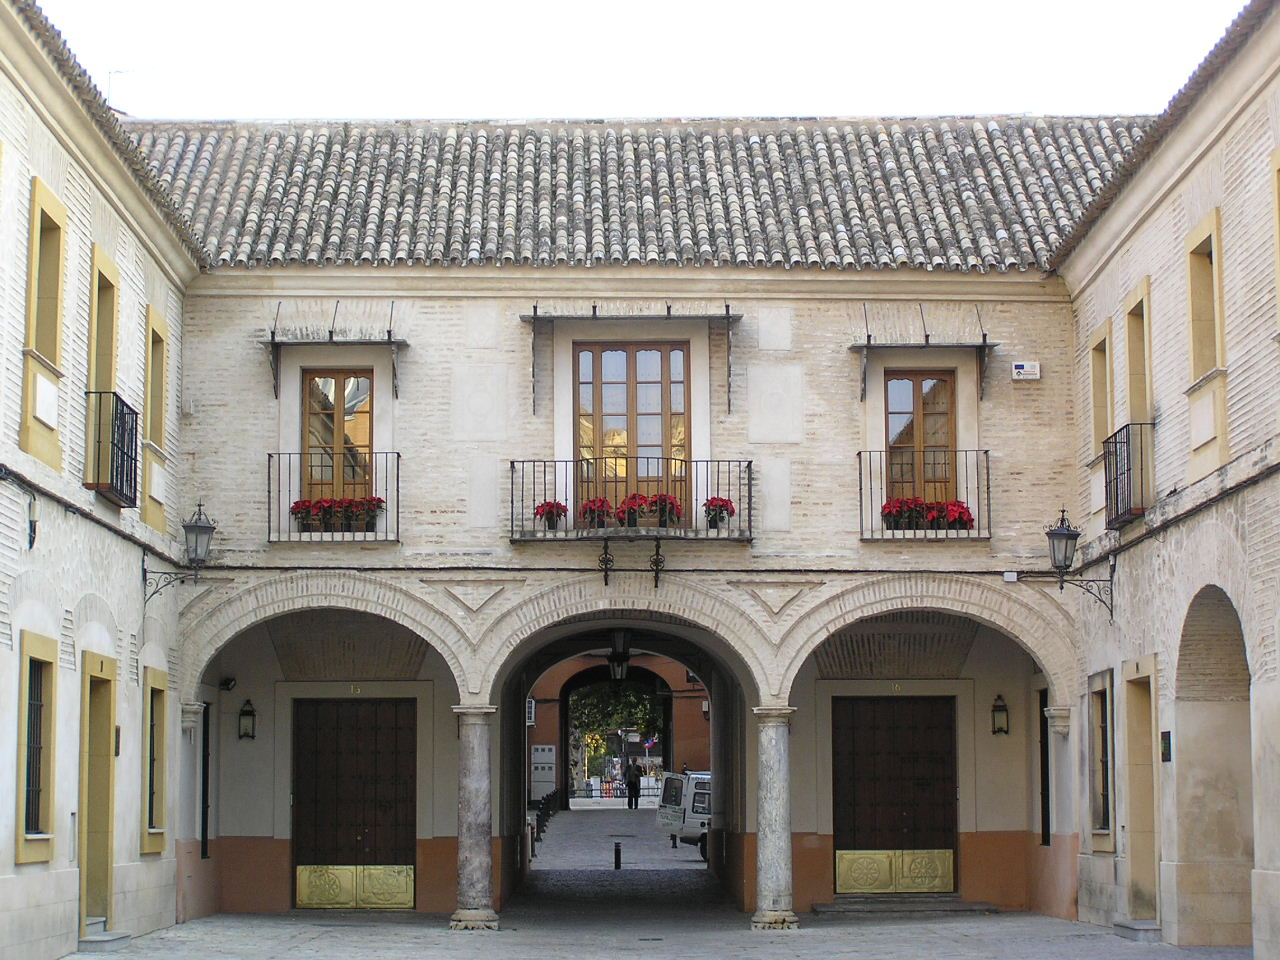 Real Casa de la Moneda de Sevilla